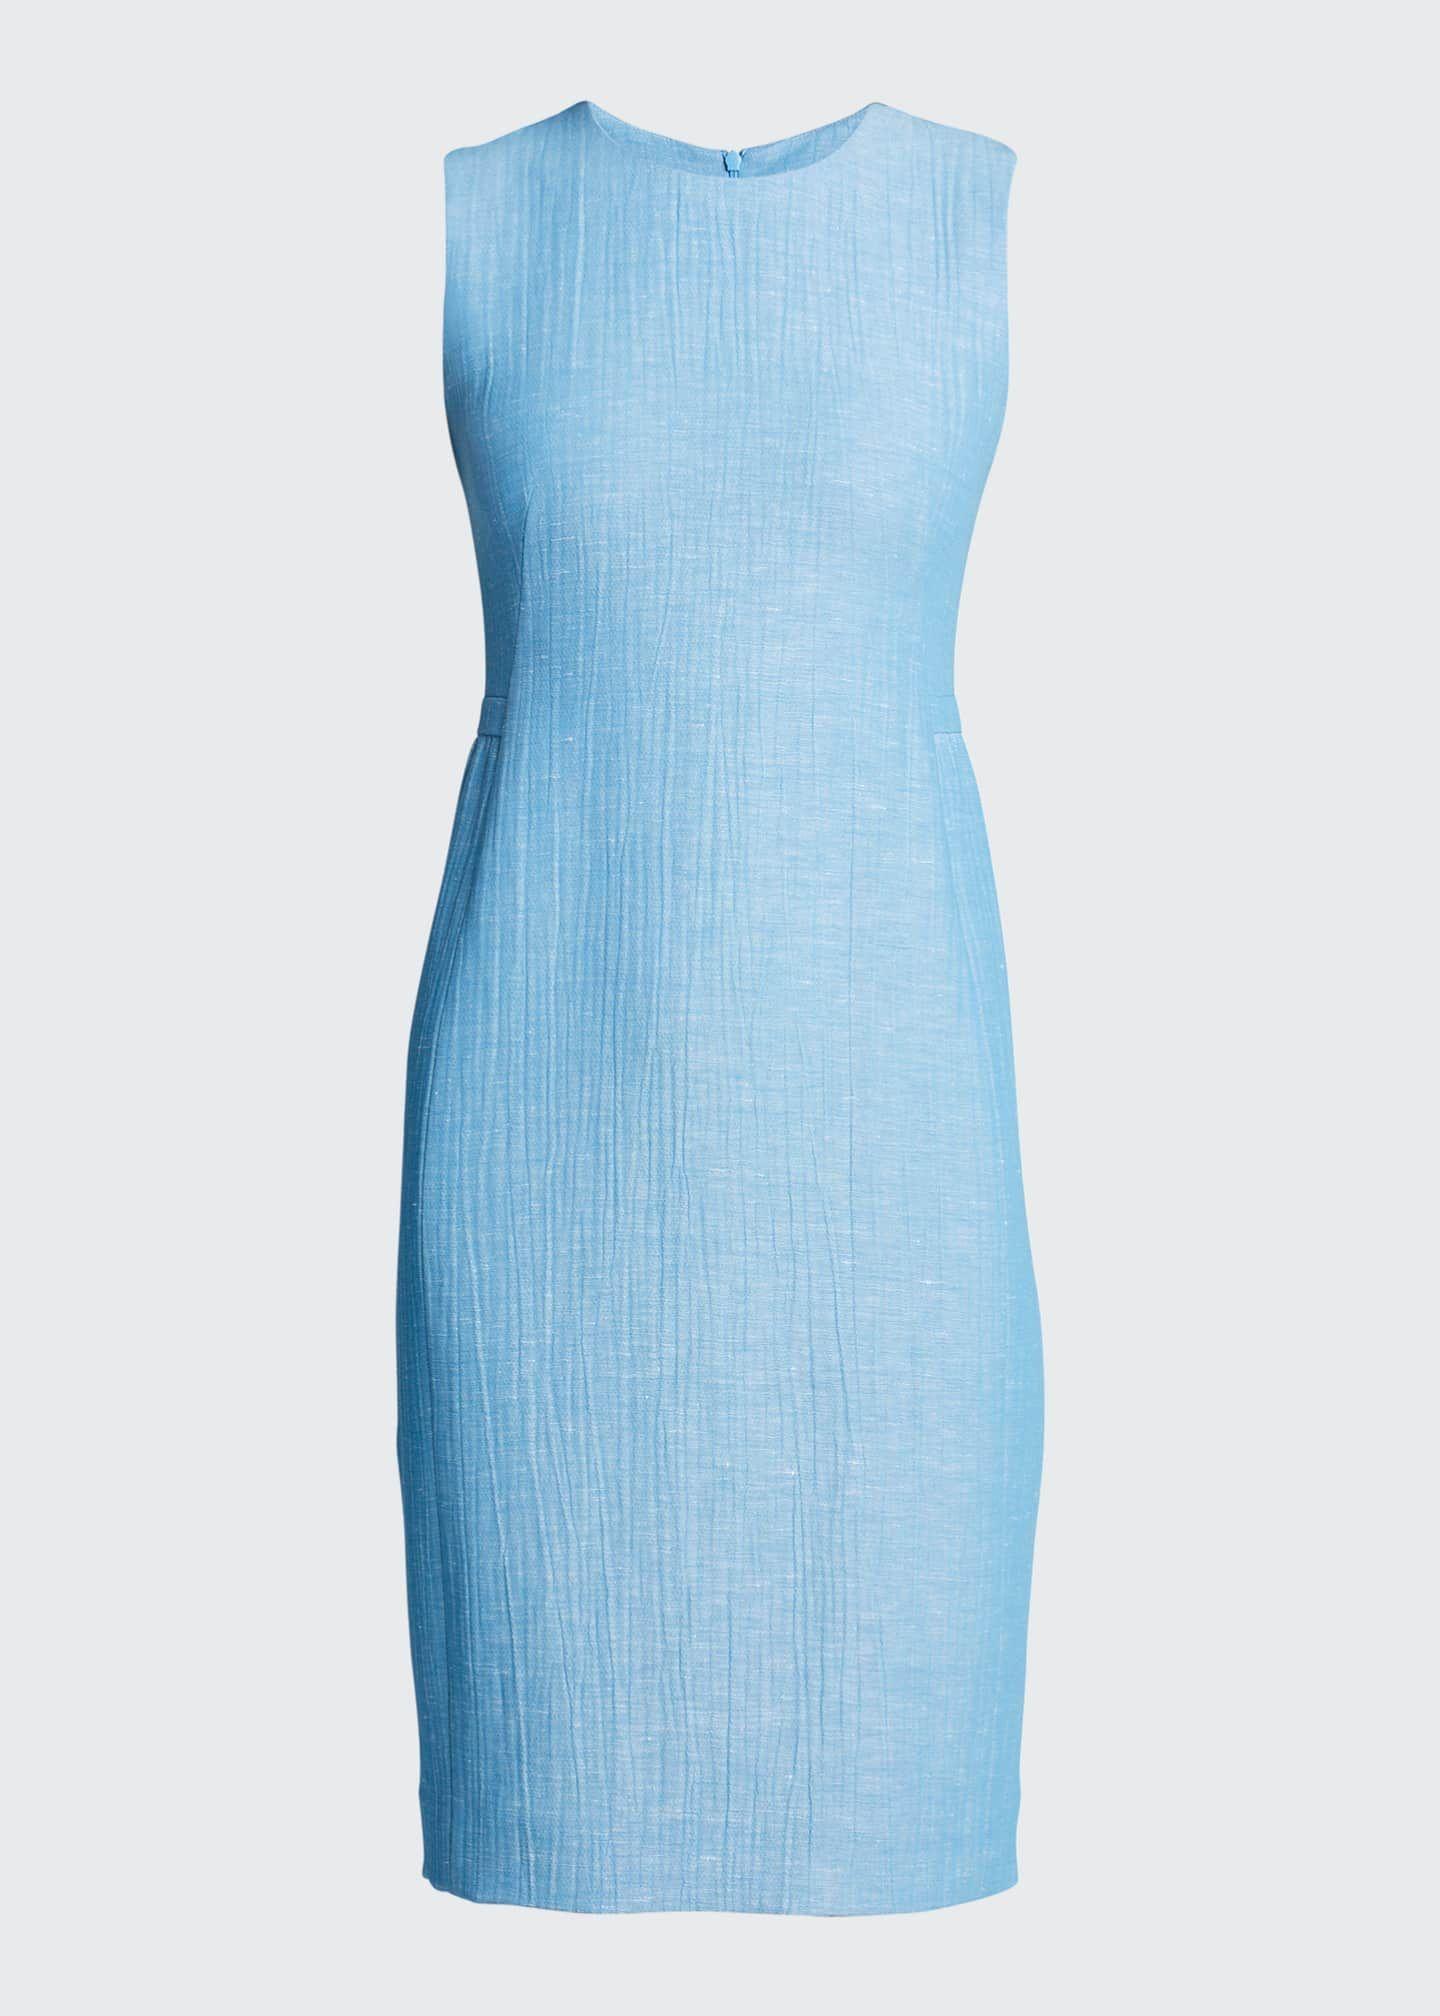 Akris Wool Blend Sleeveless Sheath Dress Akris Dress Dresses Sleeveless Sheath Dress [ 2016 x 1440 Pixel ]